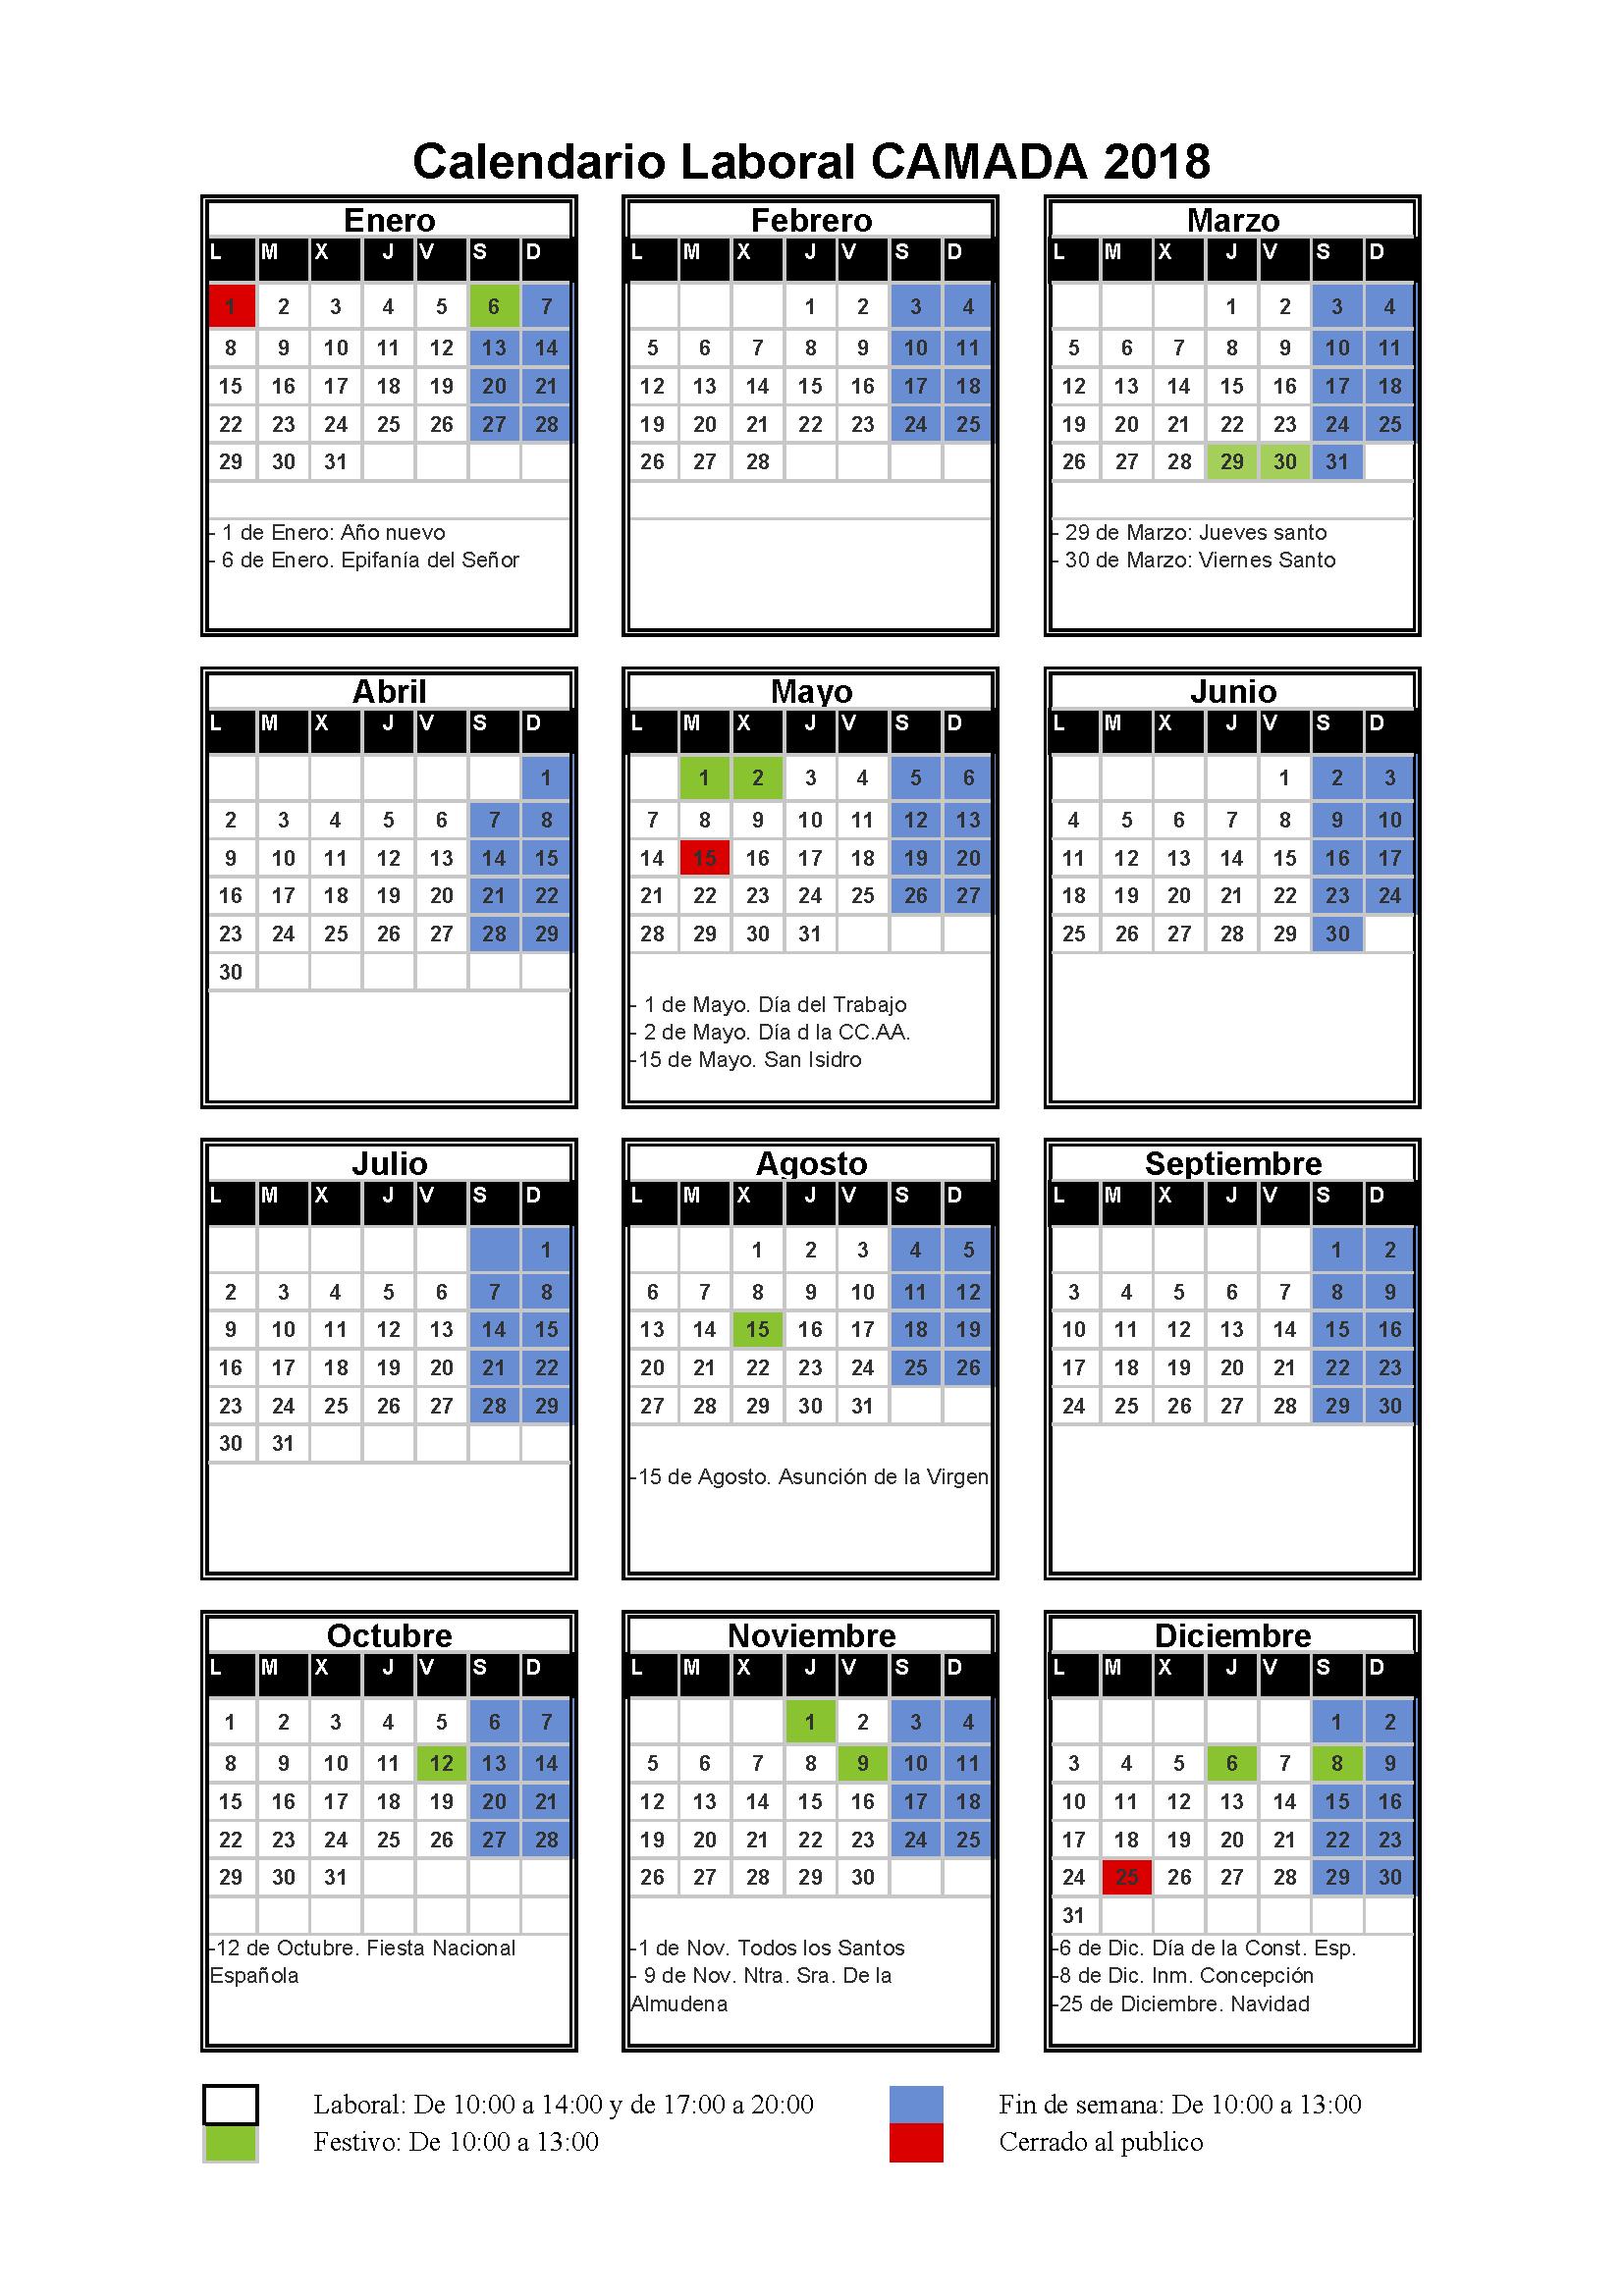 Calendario laboral Camada 2018